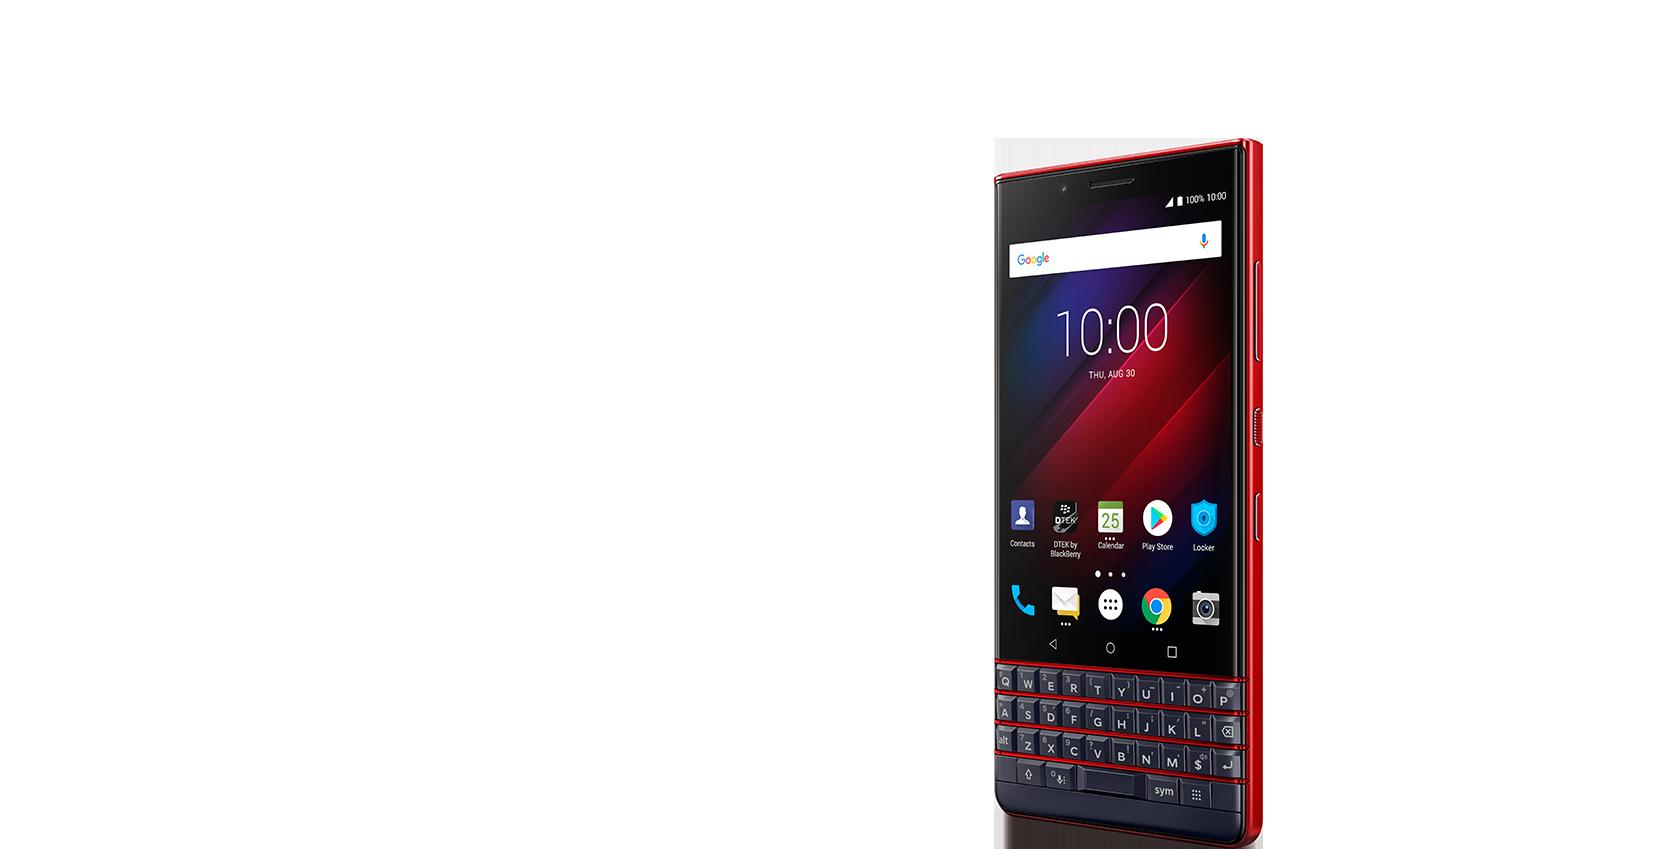 key 2 le atomic - BlackBerry KEY 2 LE